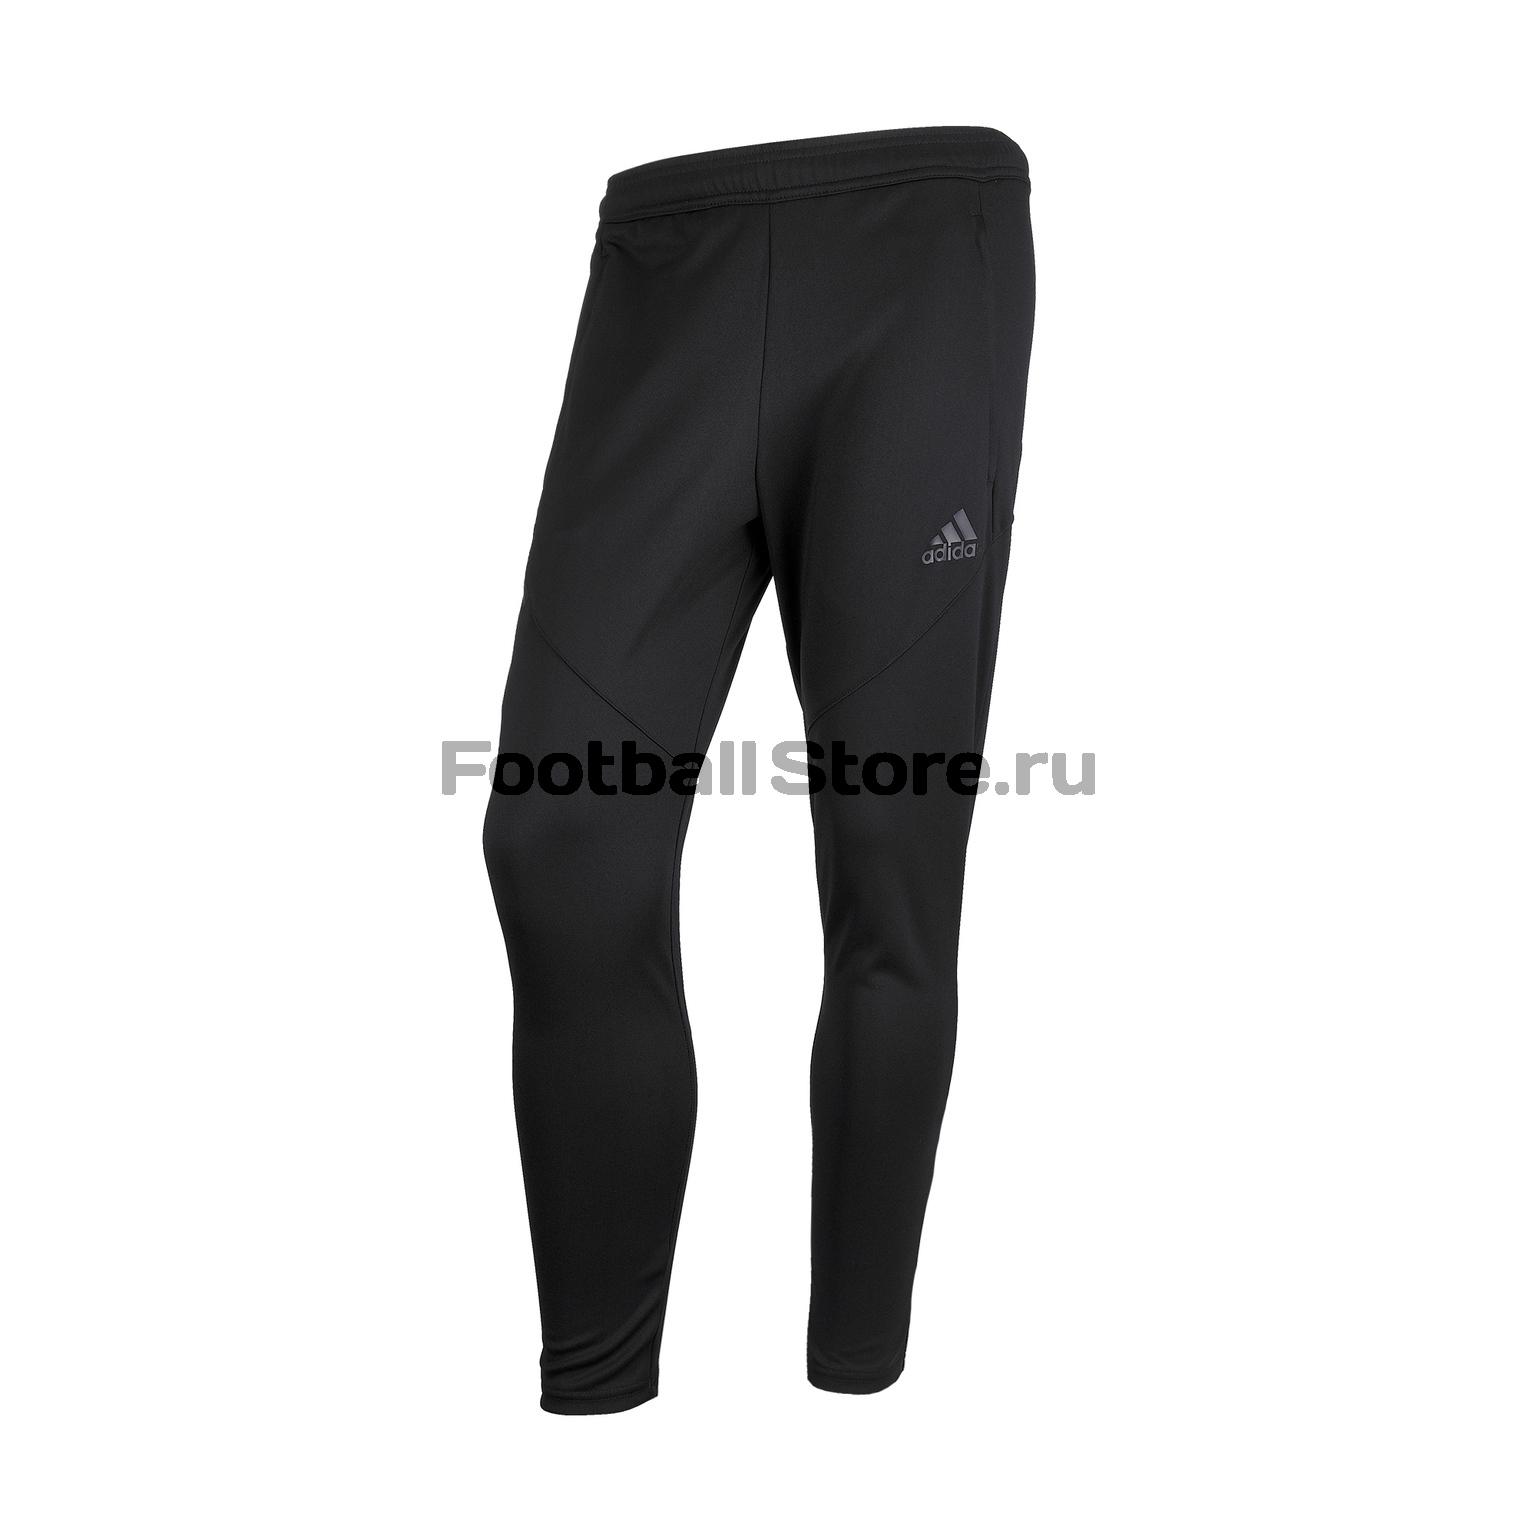 Брюки Adidas Tango EC8553 цена 2017